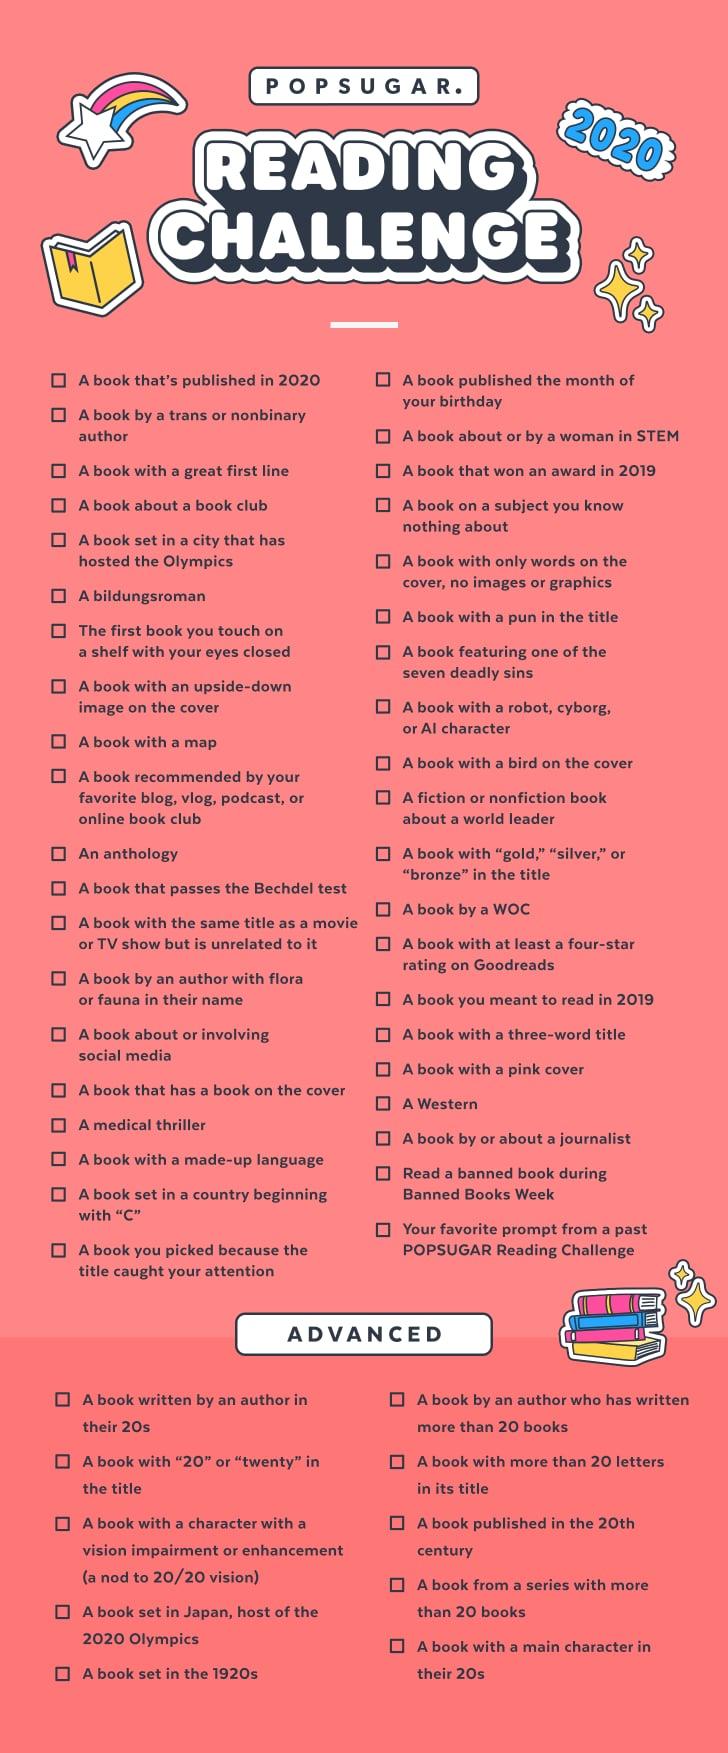 Book List 2020.Take The 2020 Popsugar Reading Challenge Popsugar